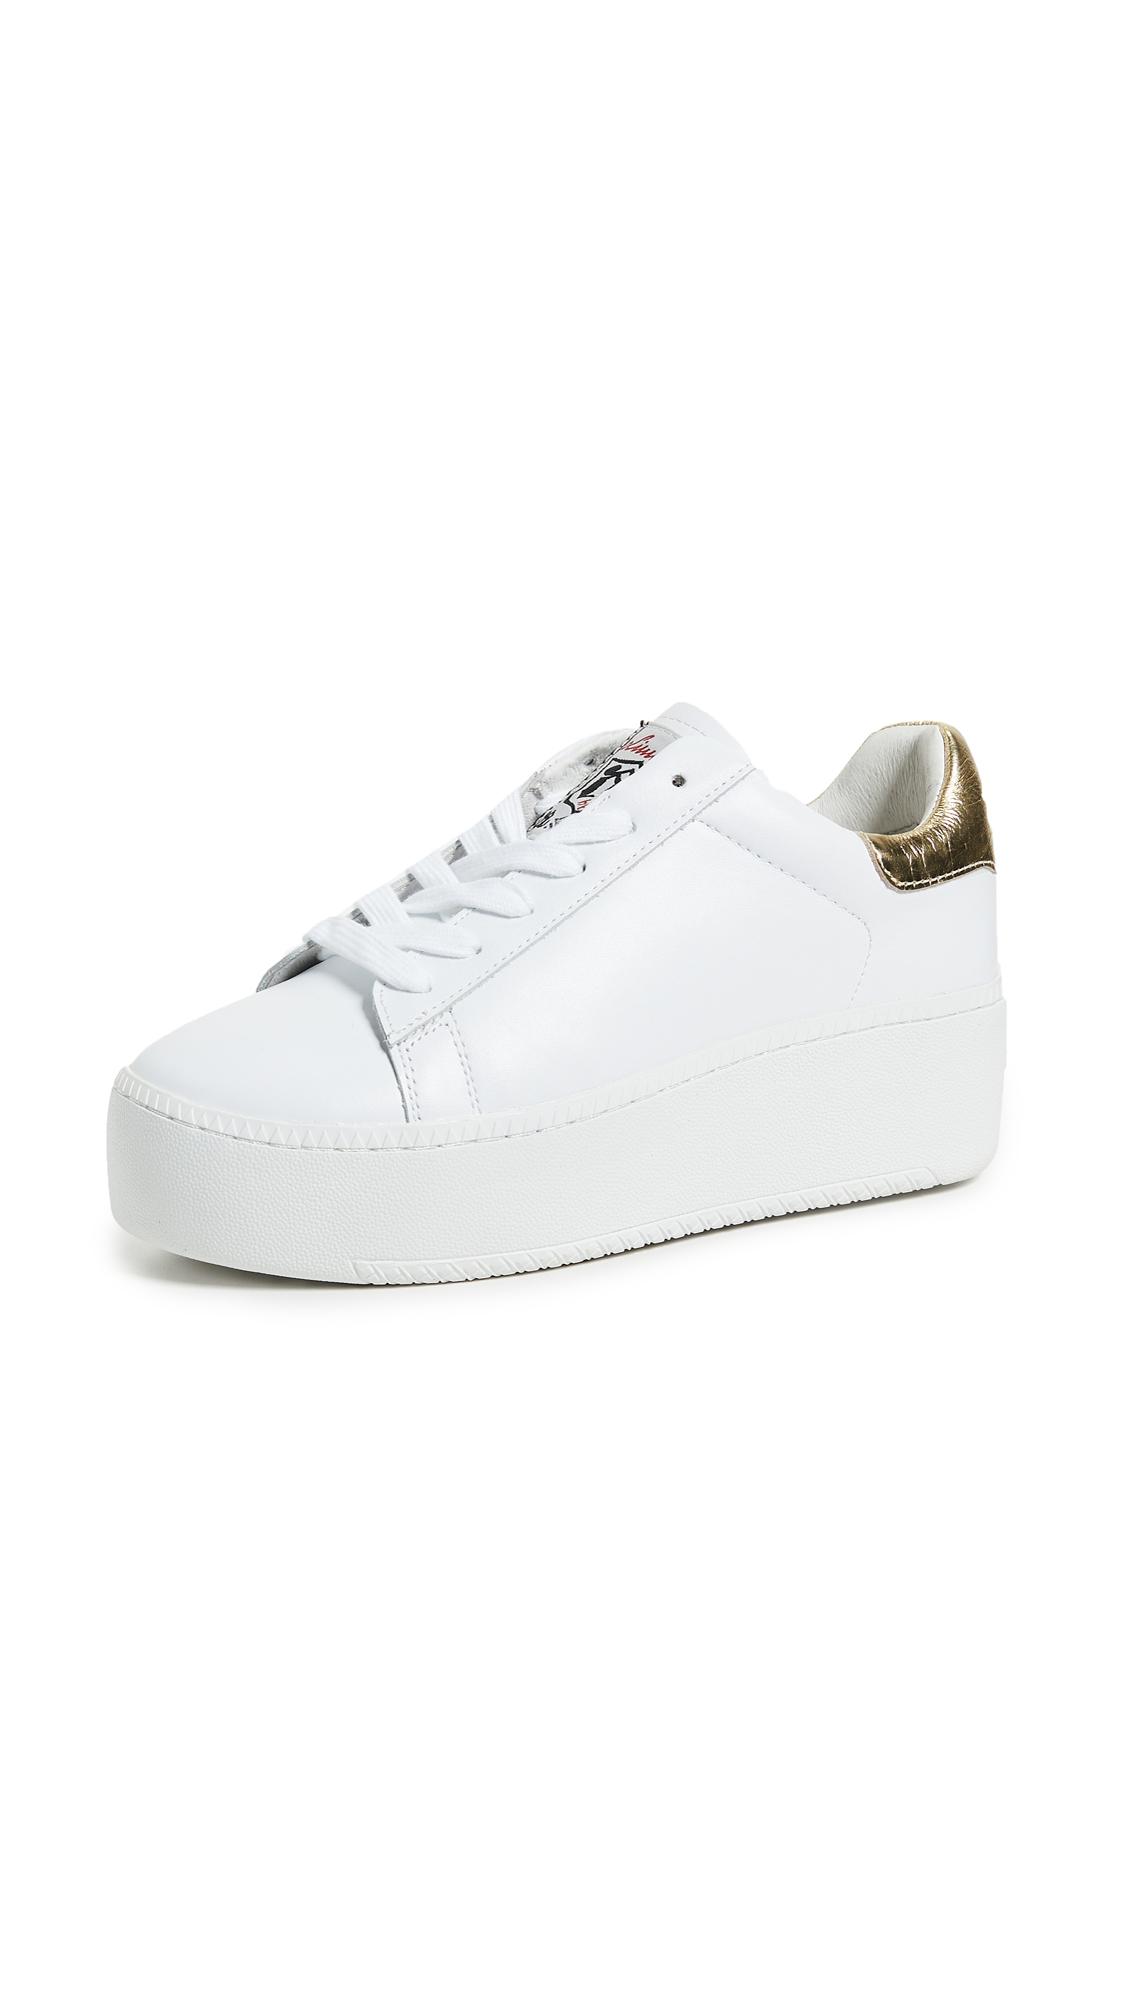 Ash Cult Platform Sneakers - White/Ariel